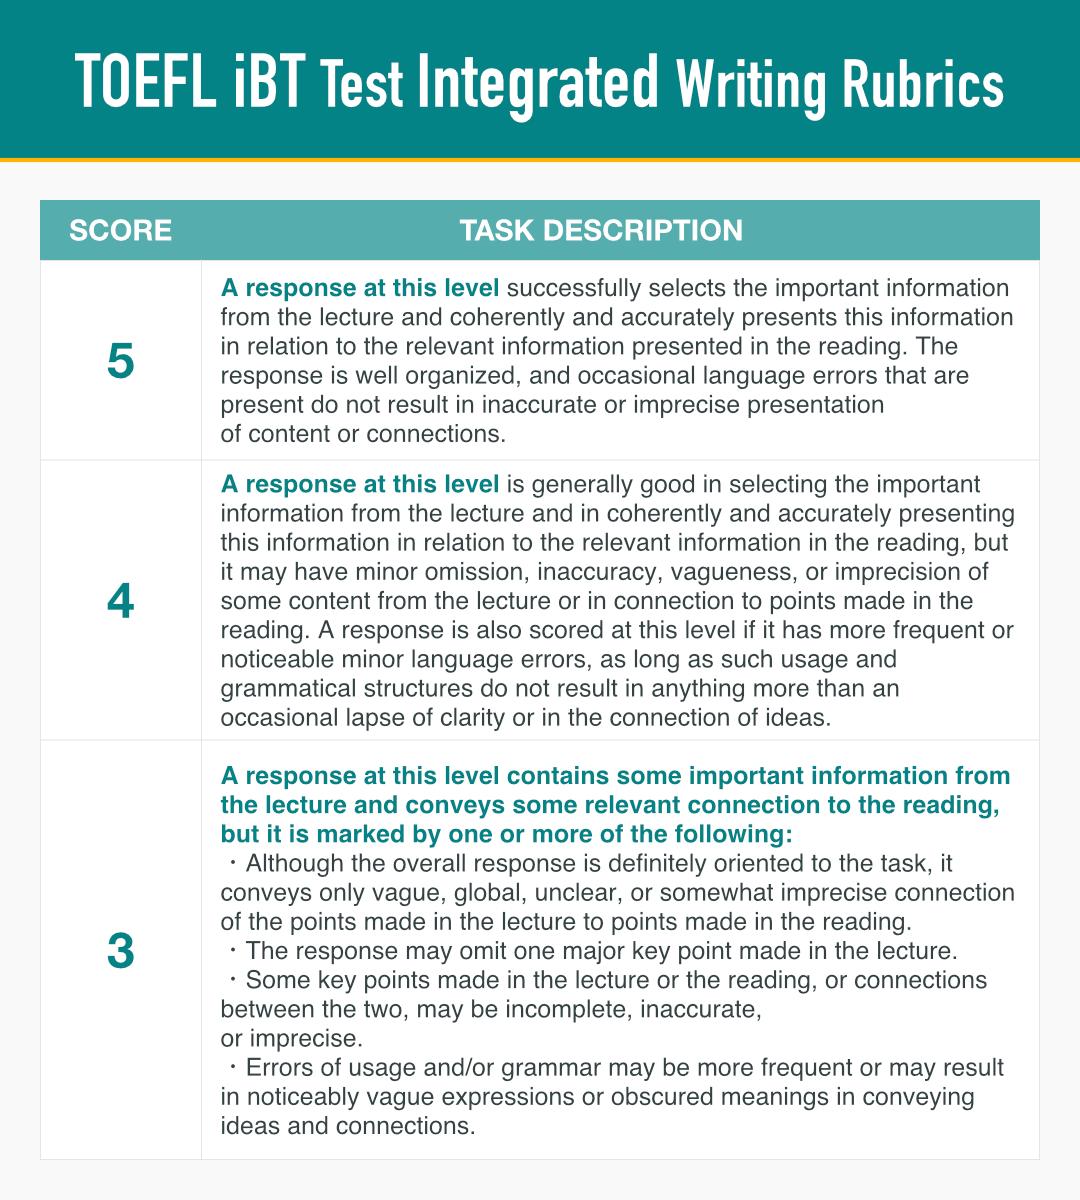 TOEFL IBT Integratedライティングの採点基準表(5~3まで)